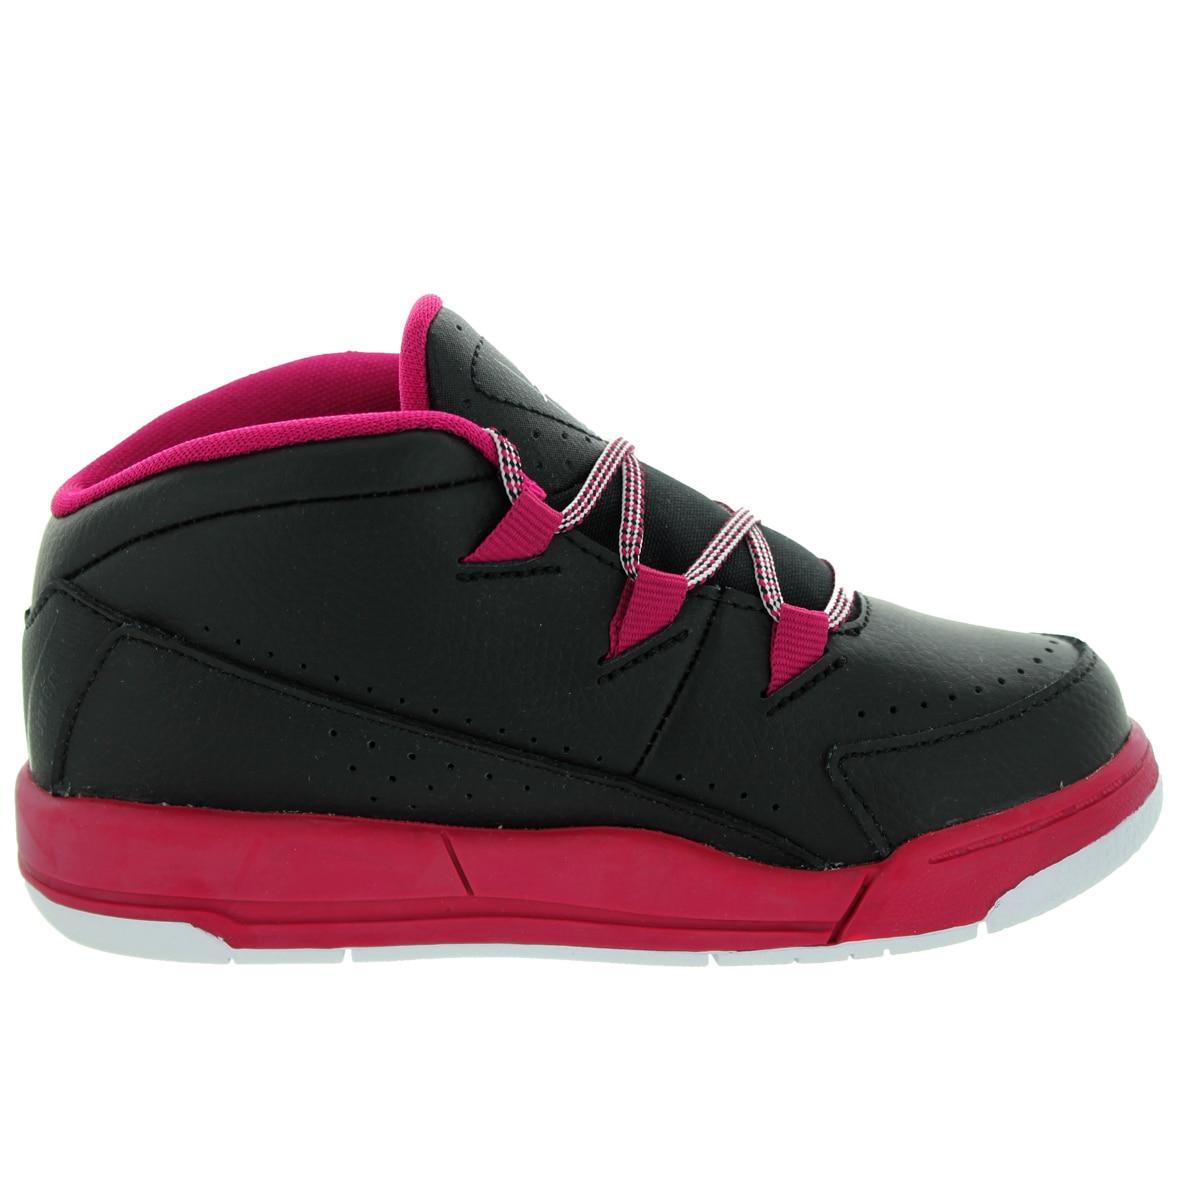 79390ac3ca12 Shop Nike Jordan Toddlers  Jordan Deluxe Gt Black White Sport Fuchsia Basketball  Shoe - Free Shipping Today - Overstock - 12321731